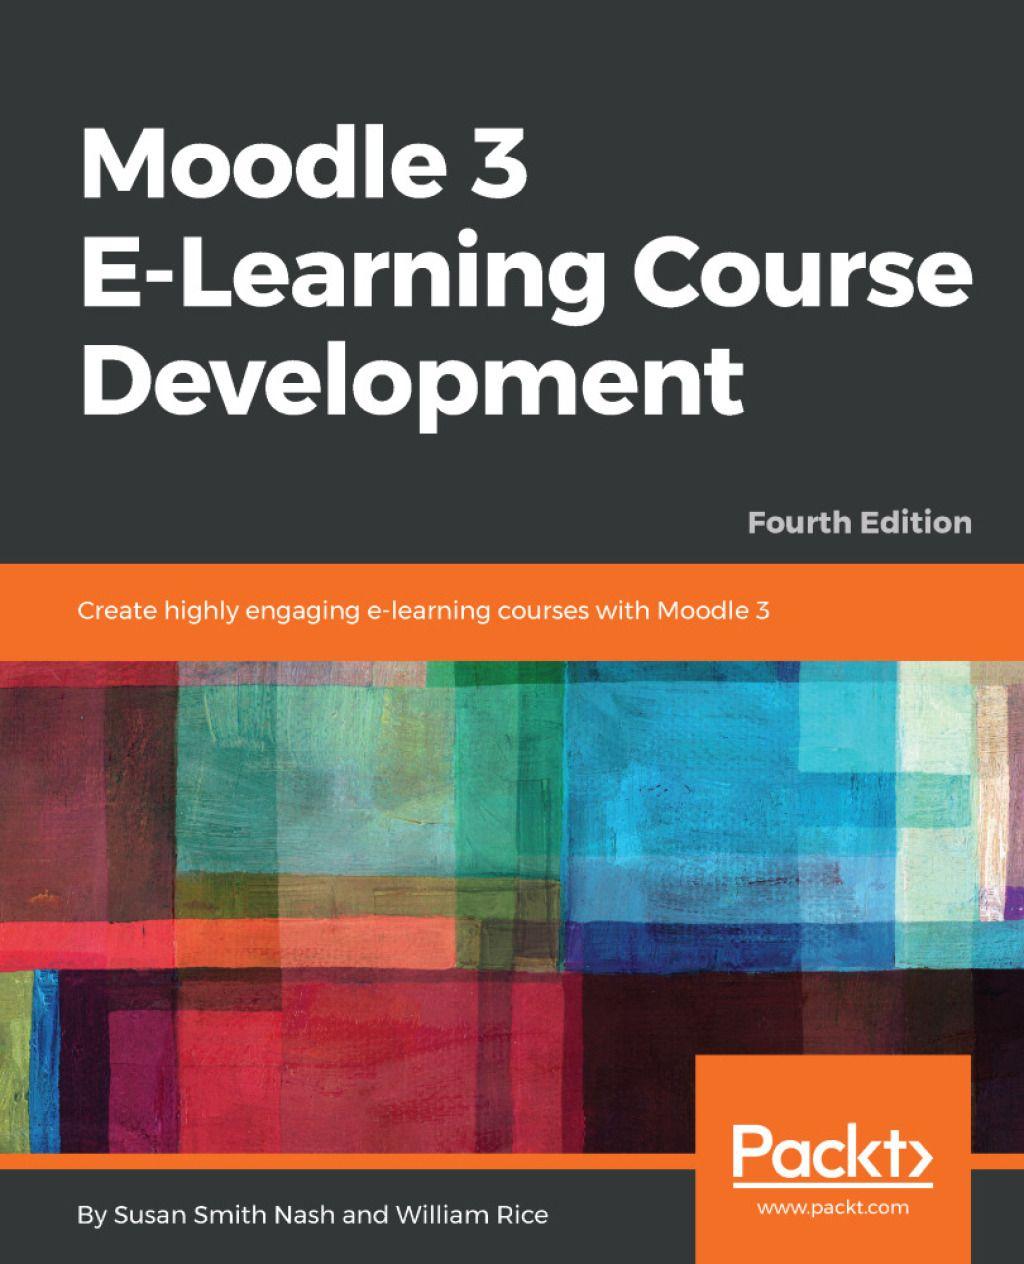 Moodle Ebook